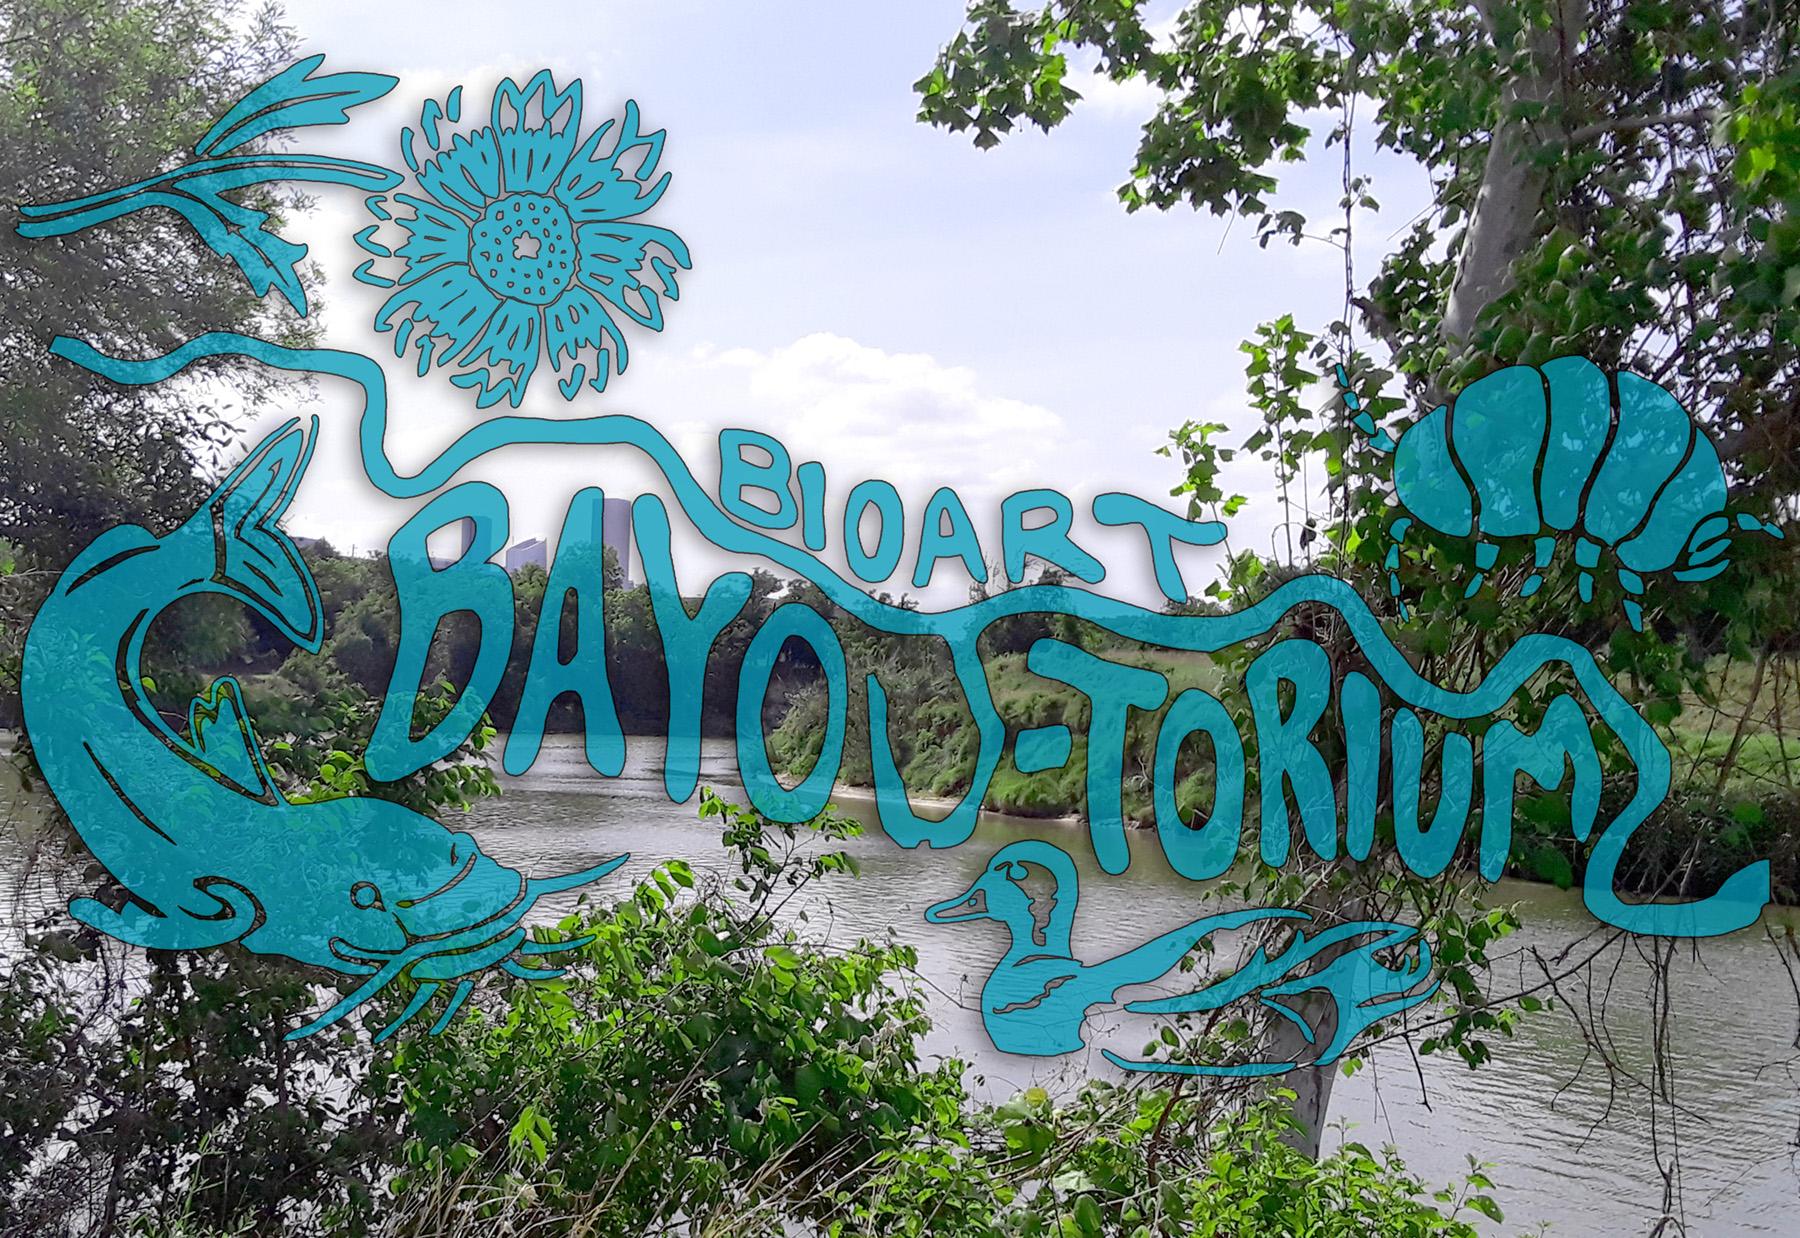 HGS-BioArt-Bayoutorium-ENGL-1.jpg